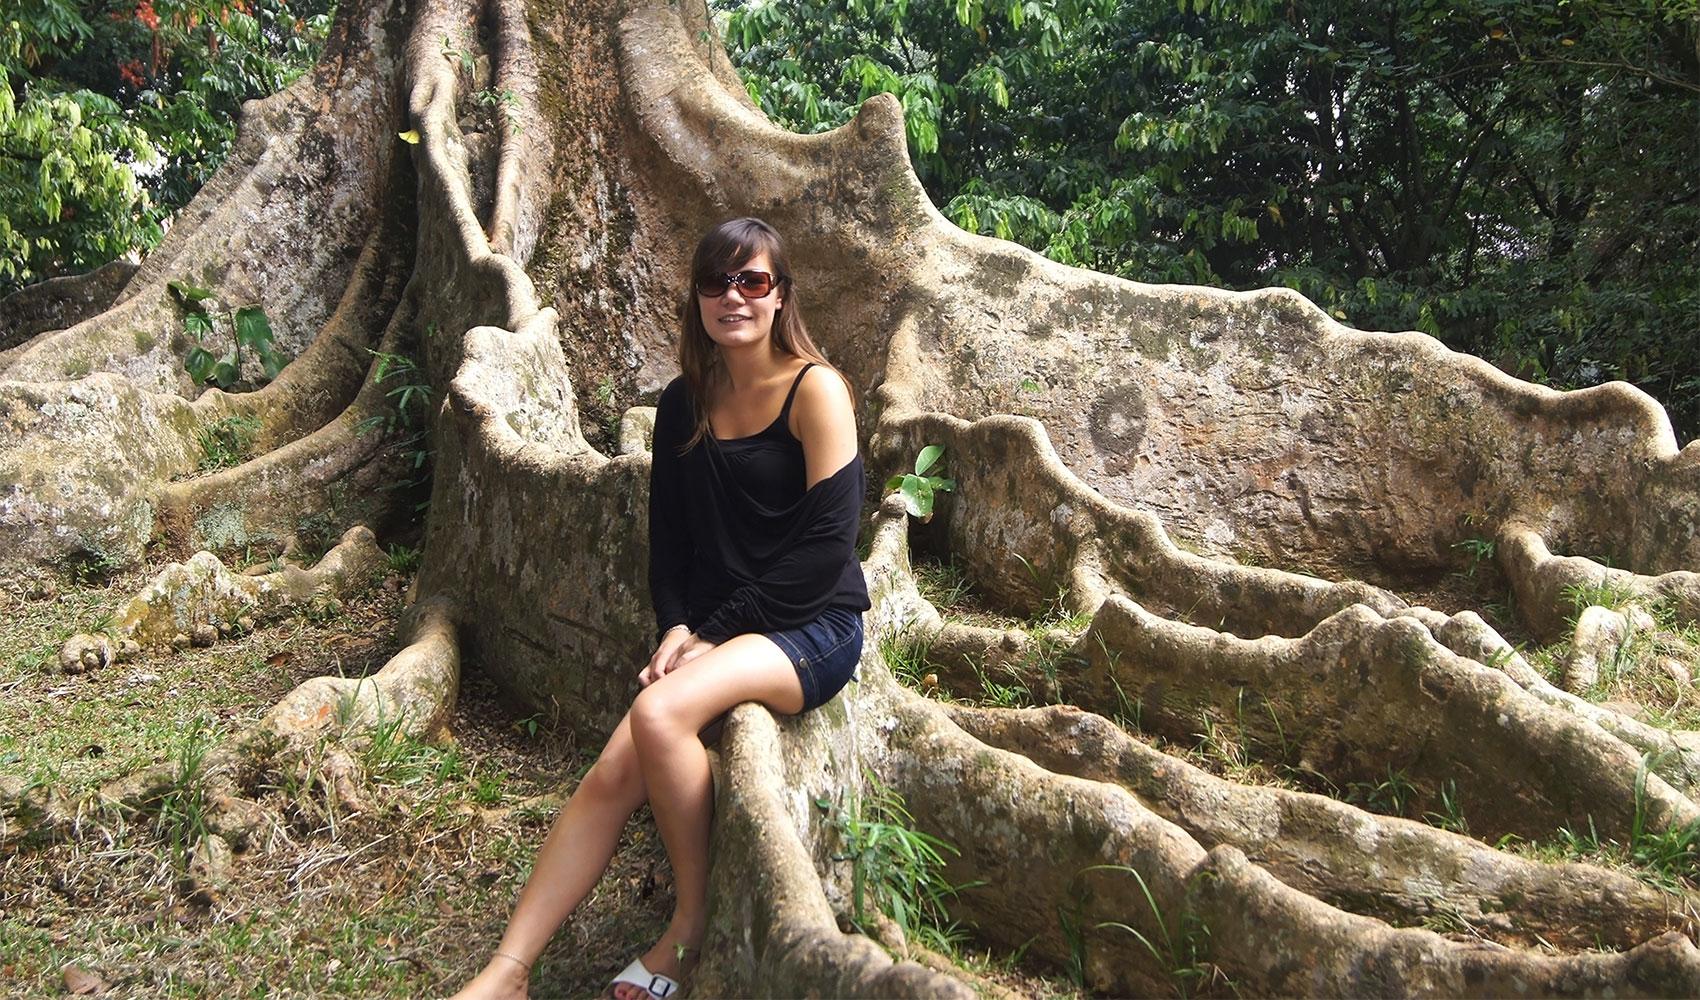 reisspecialist rosselle | rama tours holland hoofdfoto